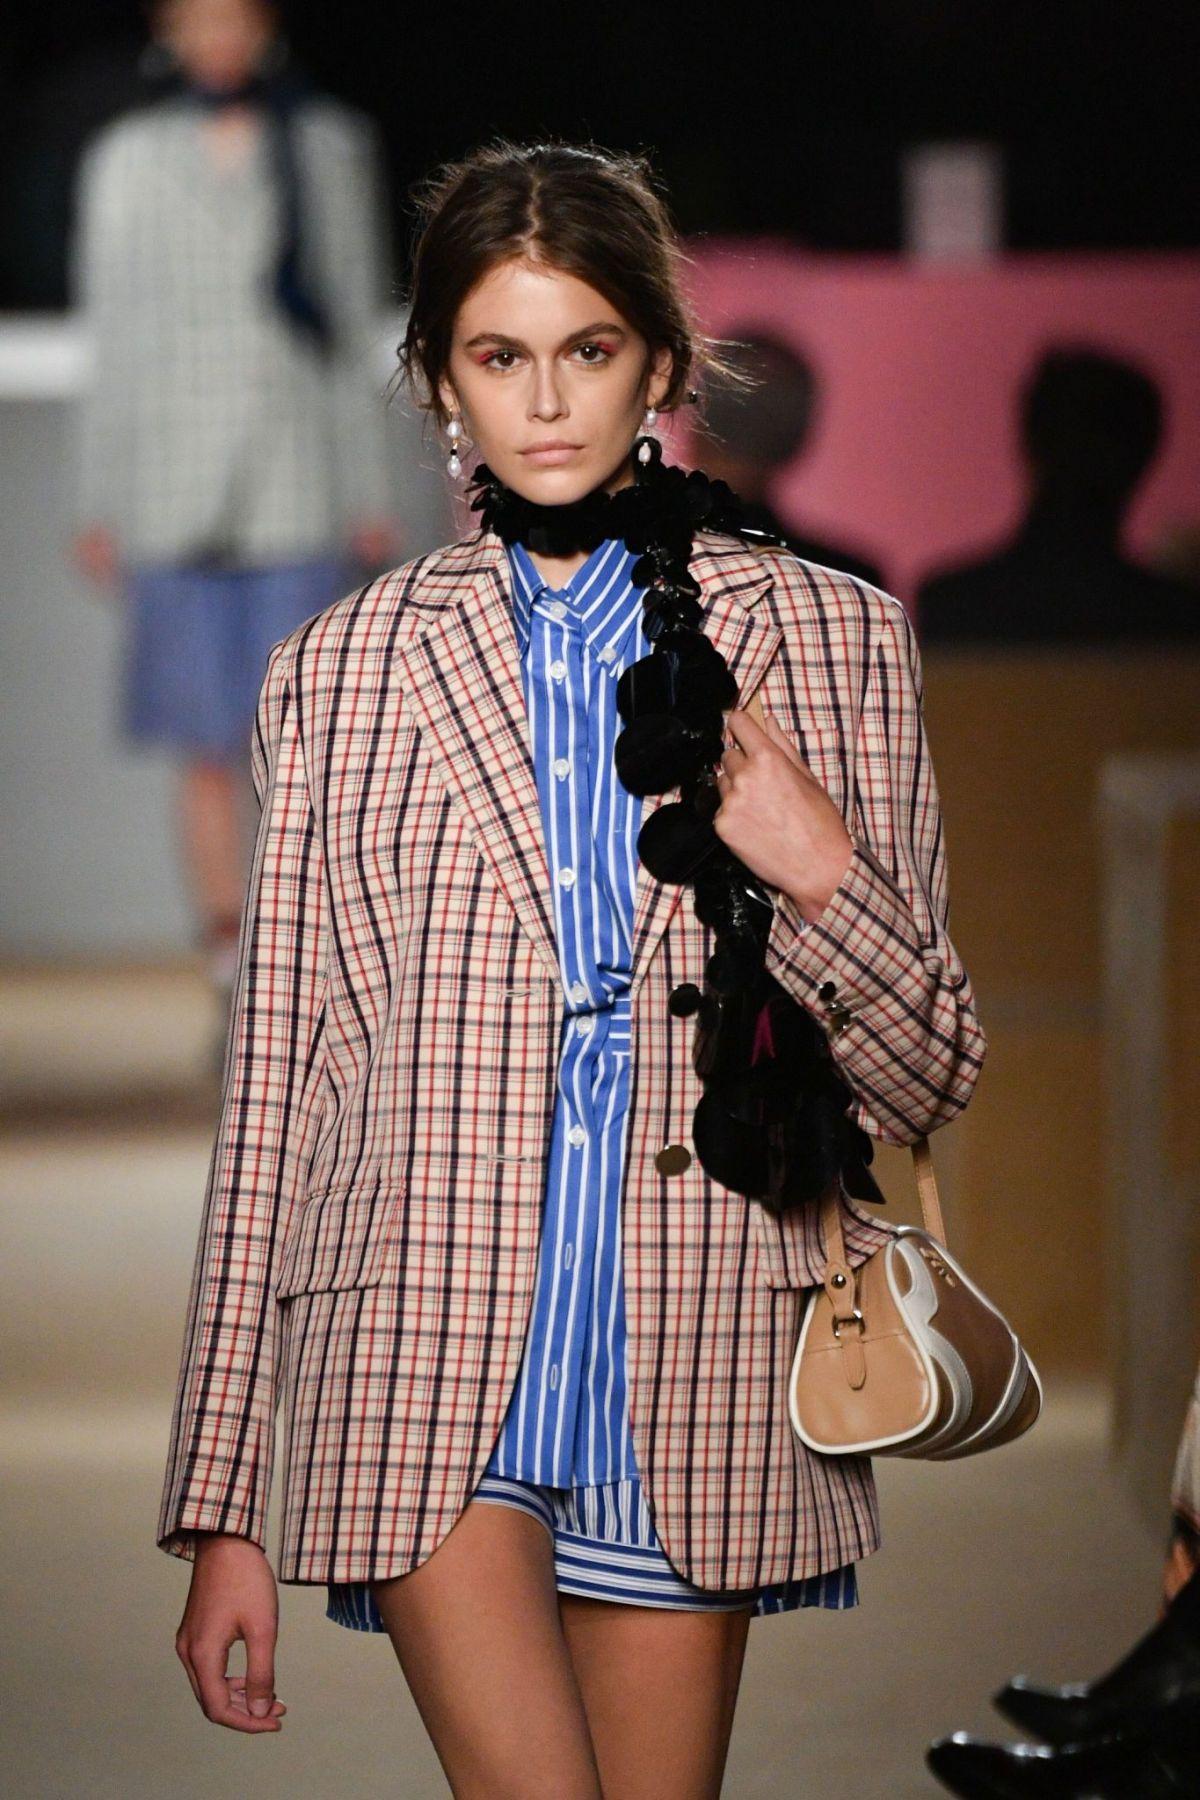 d7e7f1691554 KAIA GERBER at Prada Resort 2020 Fashion Show in New York 05 02 2019 ...